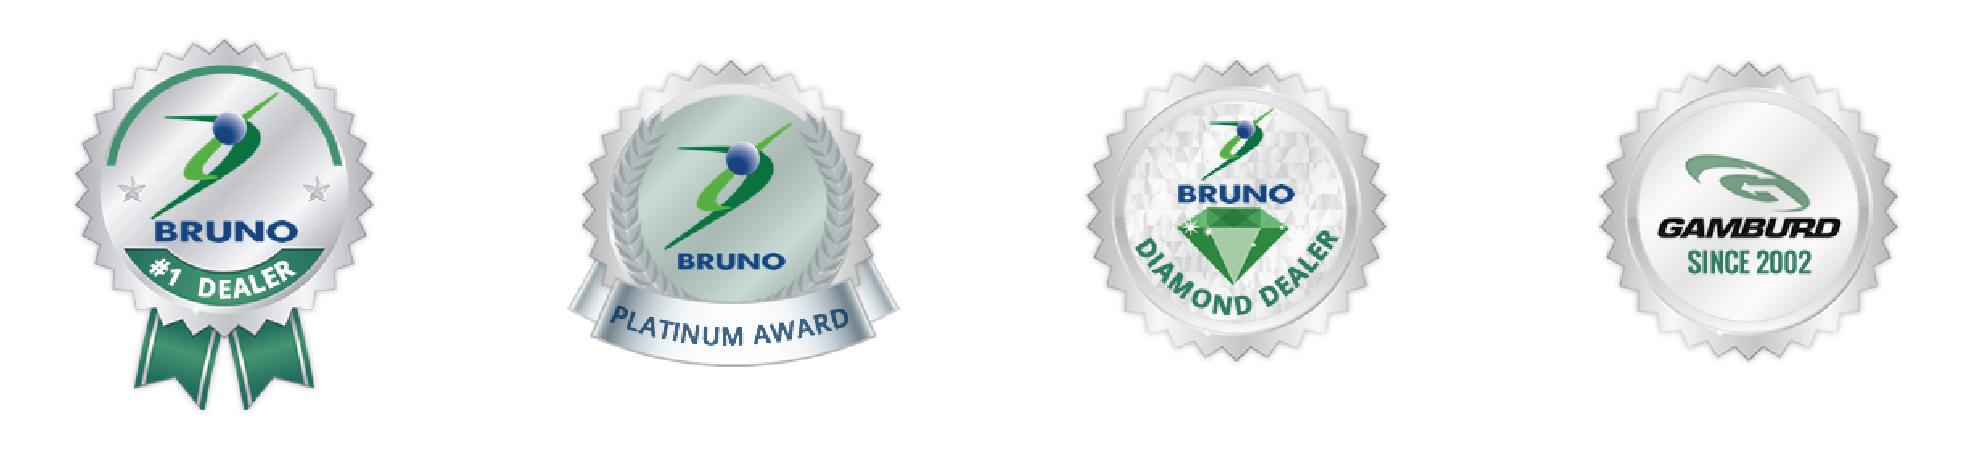 Gamburd award badges